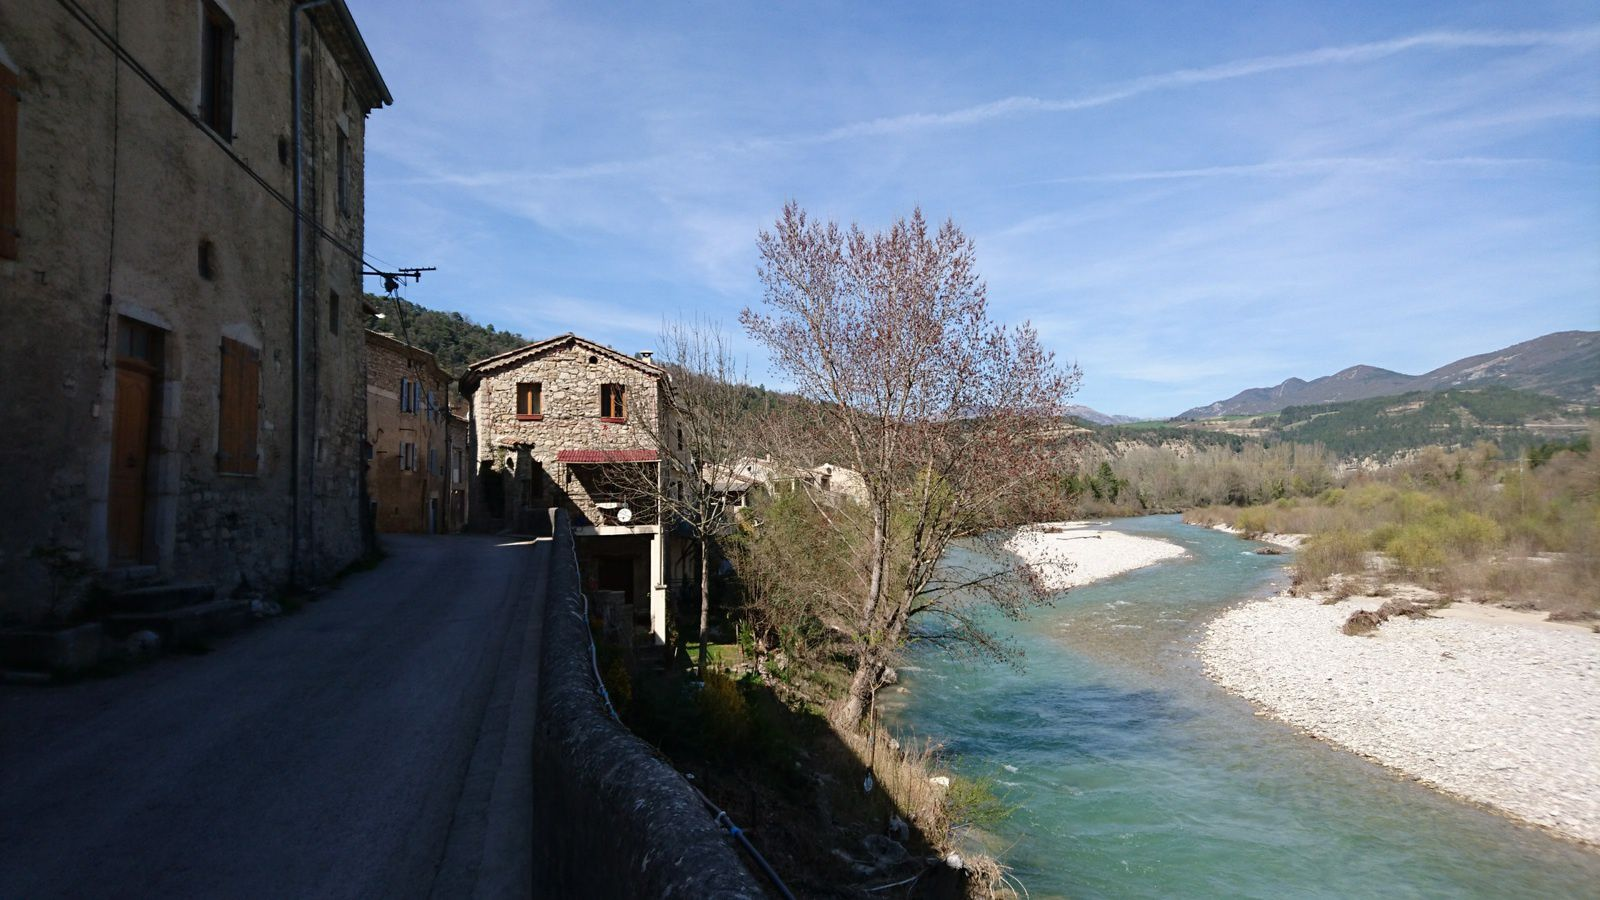 La Drôme à Pontaix (amont)